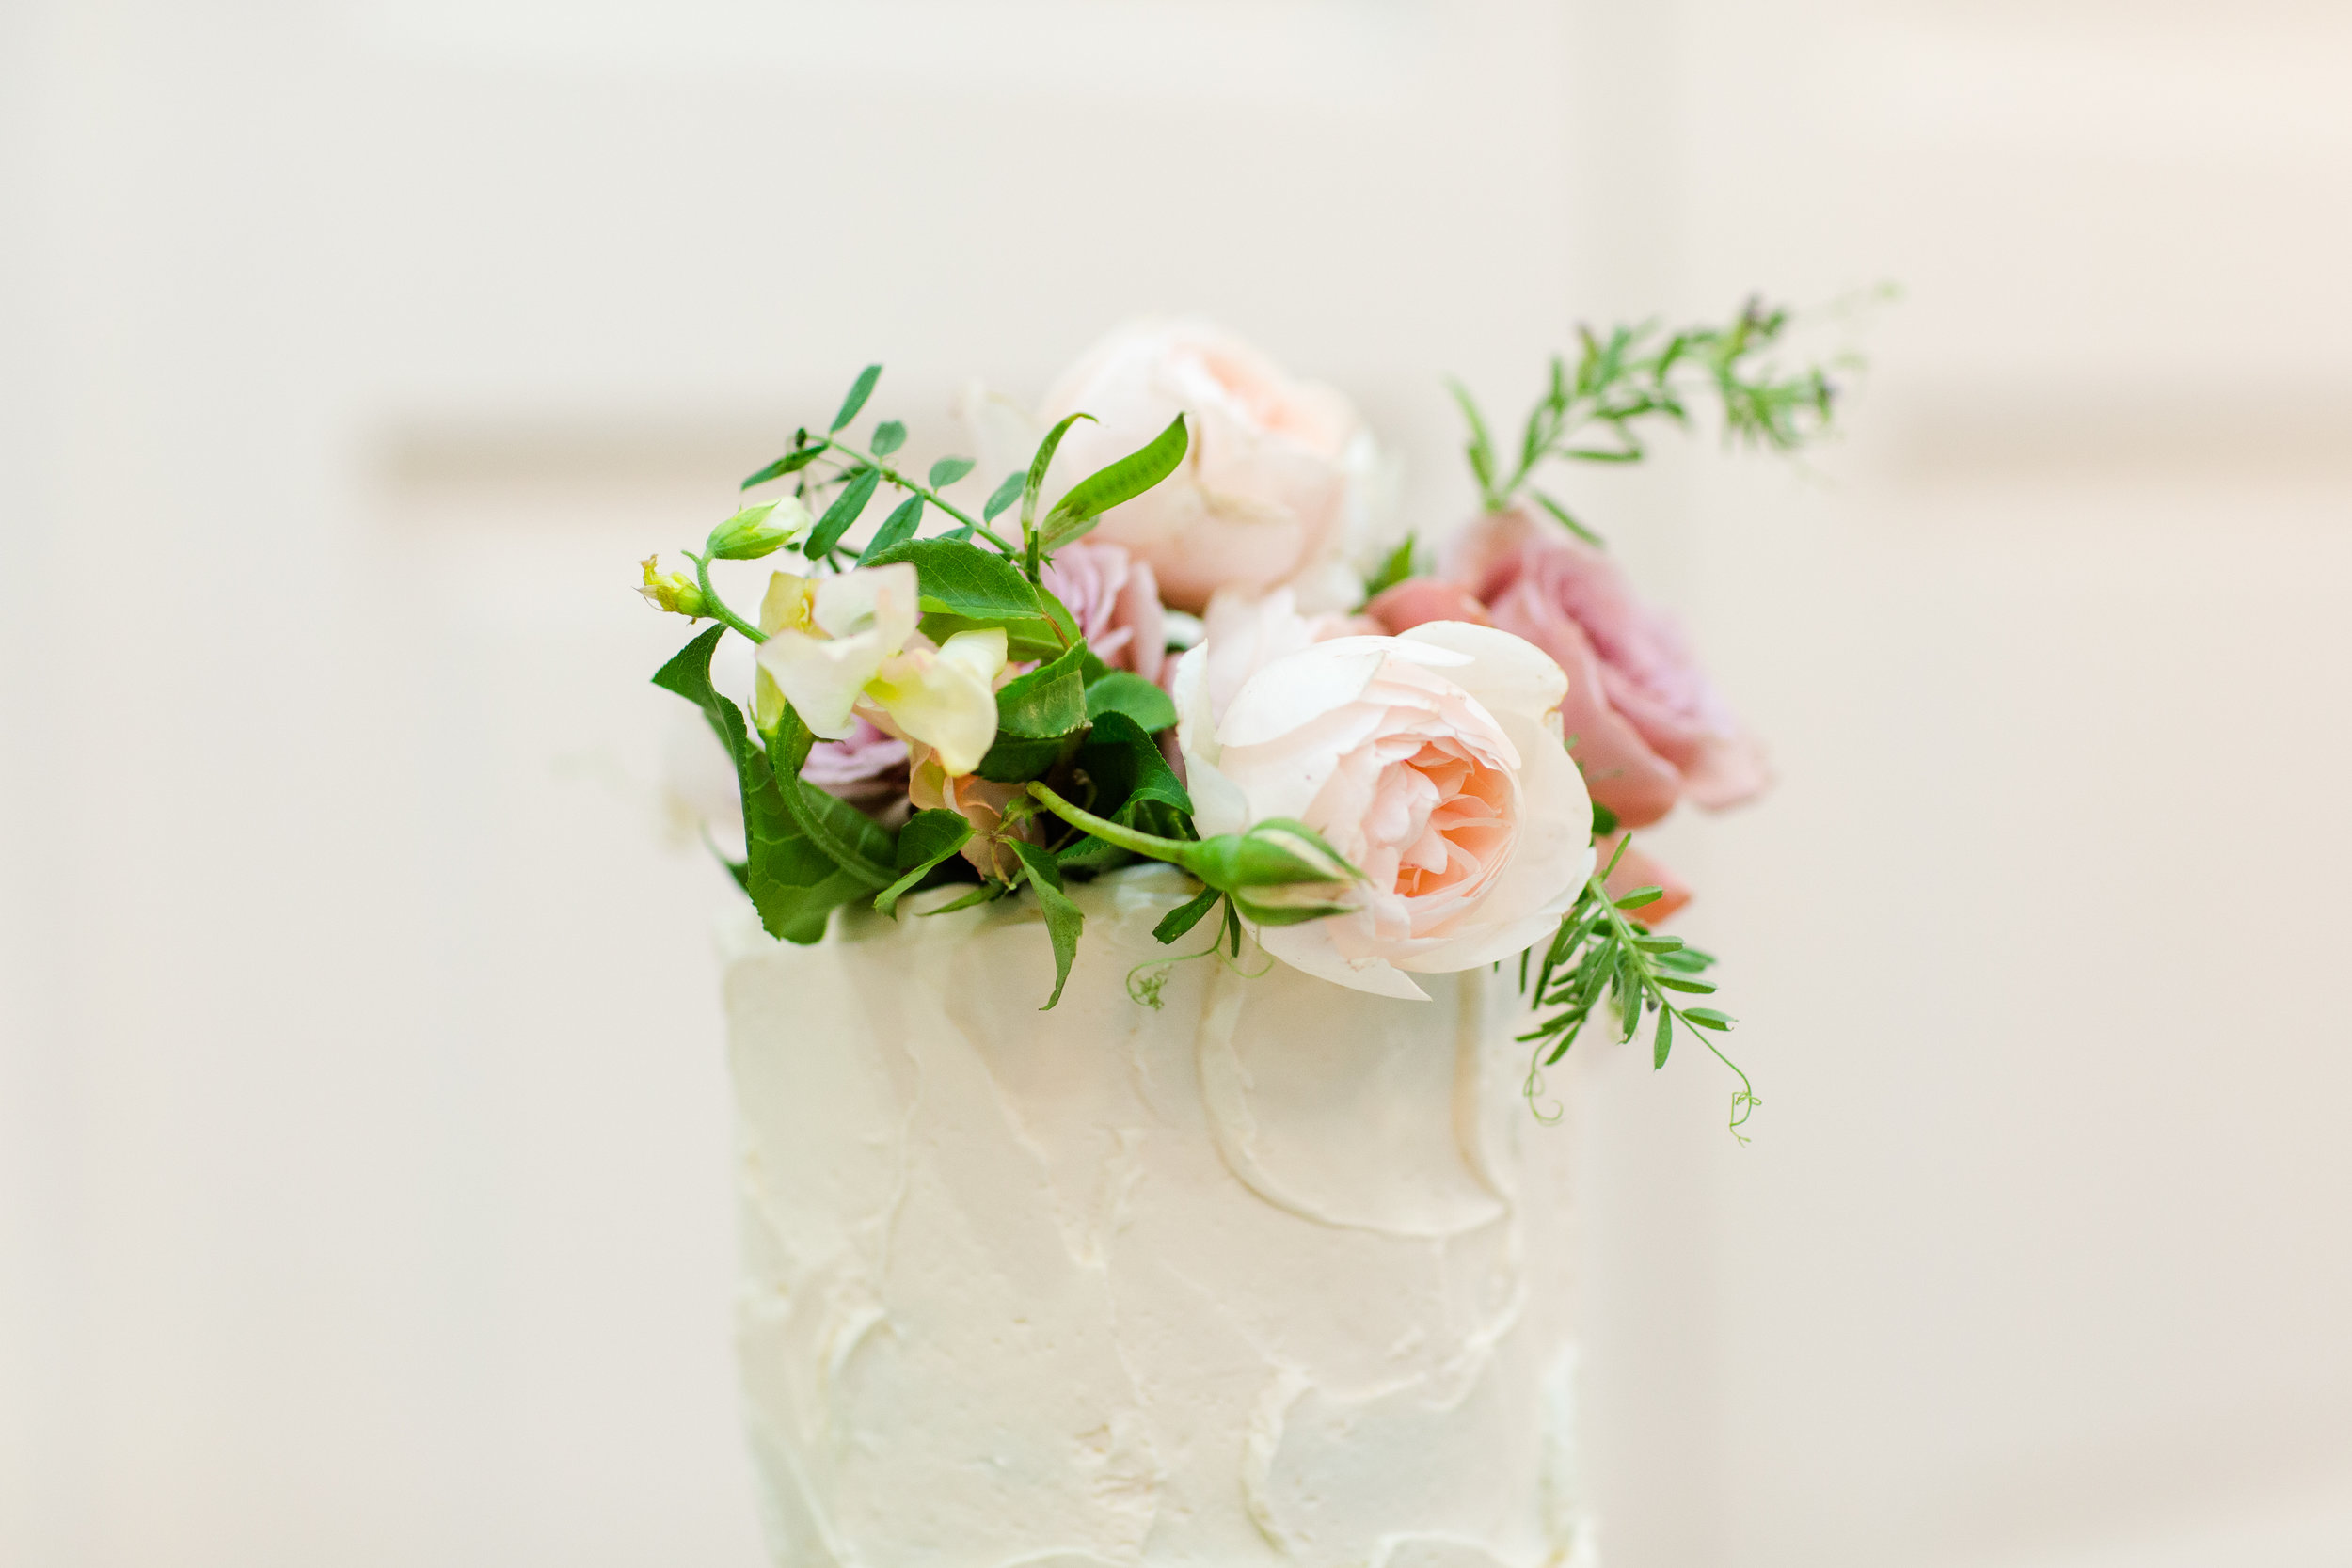 glenview-mansion-rockville-maryland-bourbon-derby-buker-wedding-reception-details-bethanne-arthur-photography-photos-104.jpg